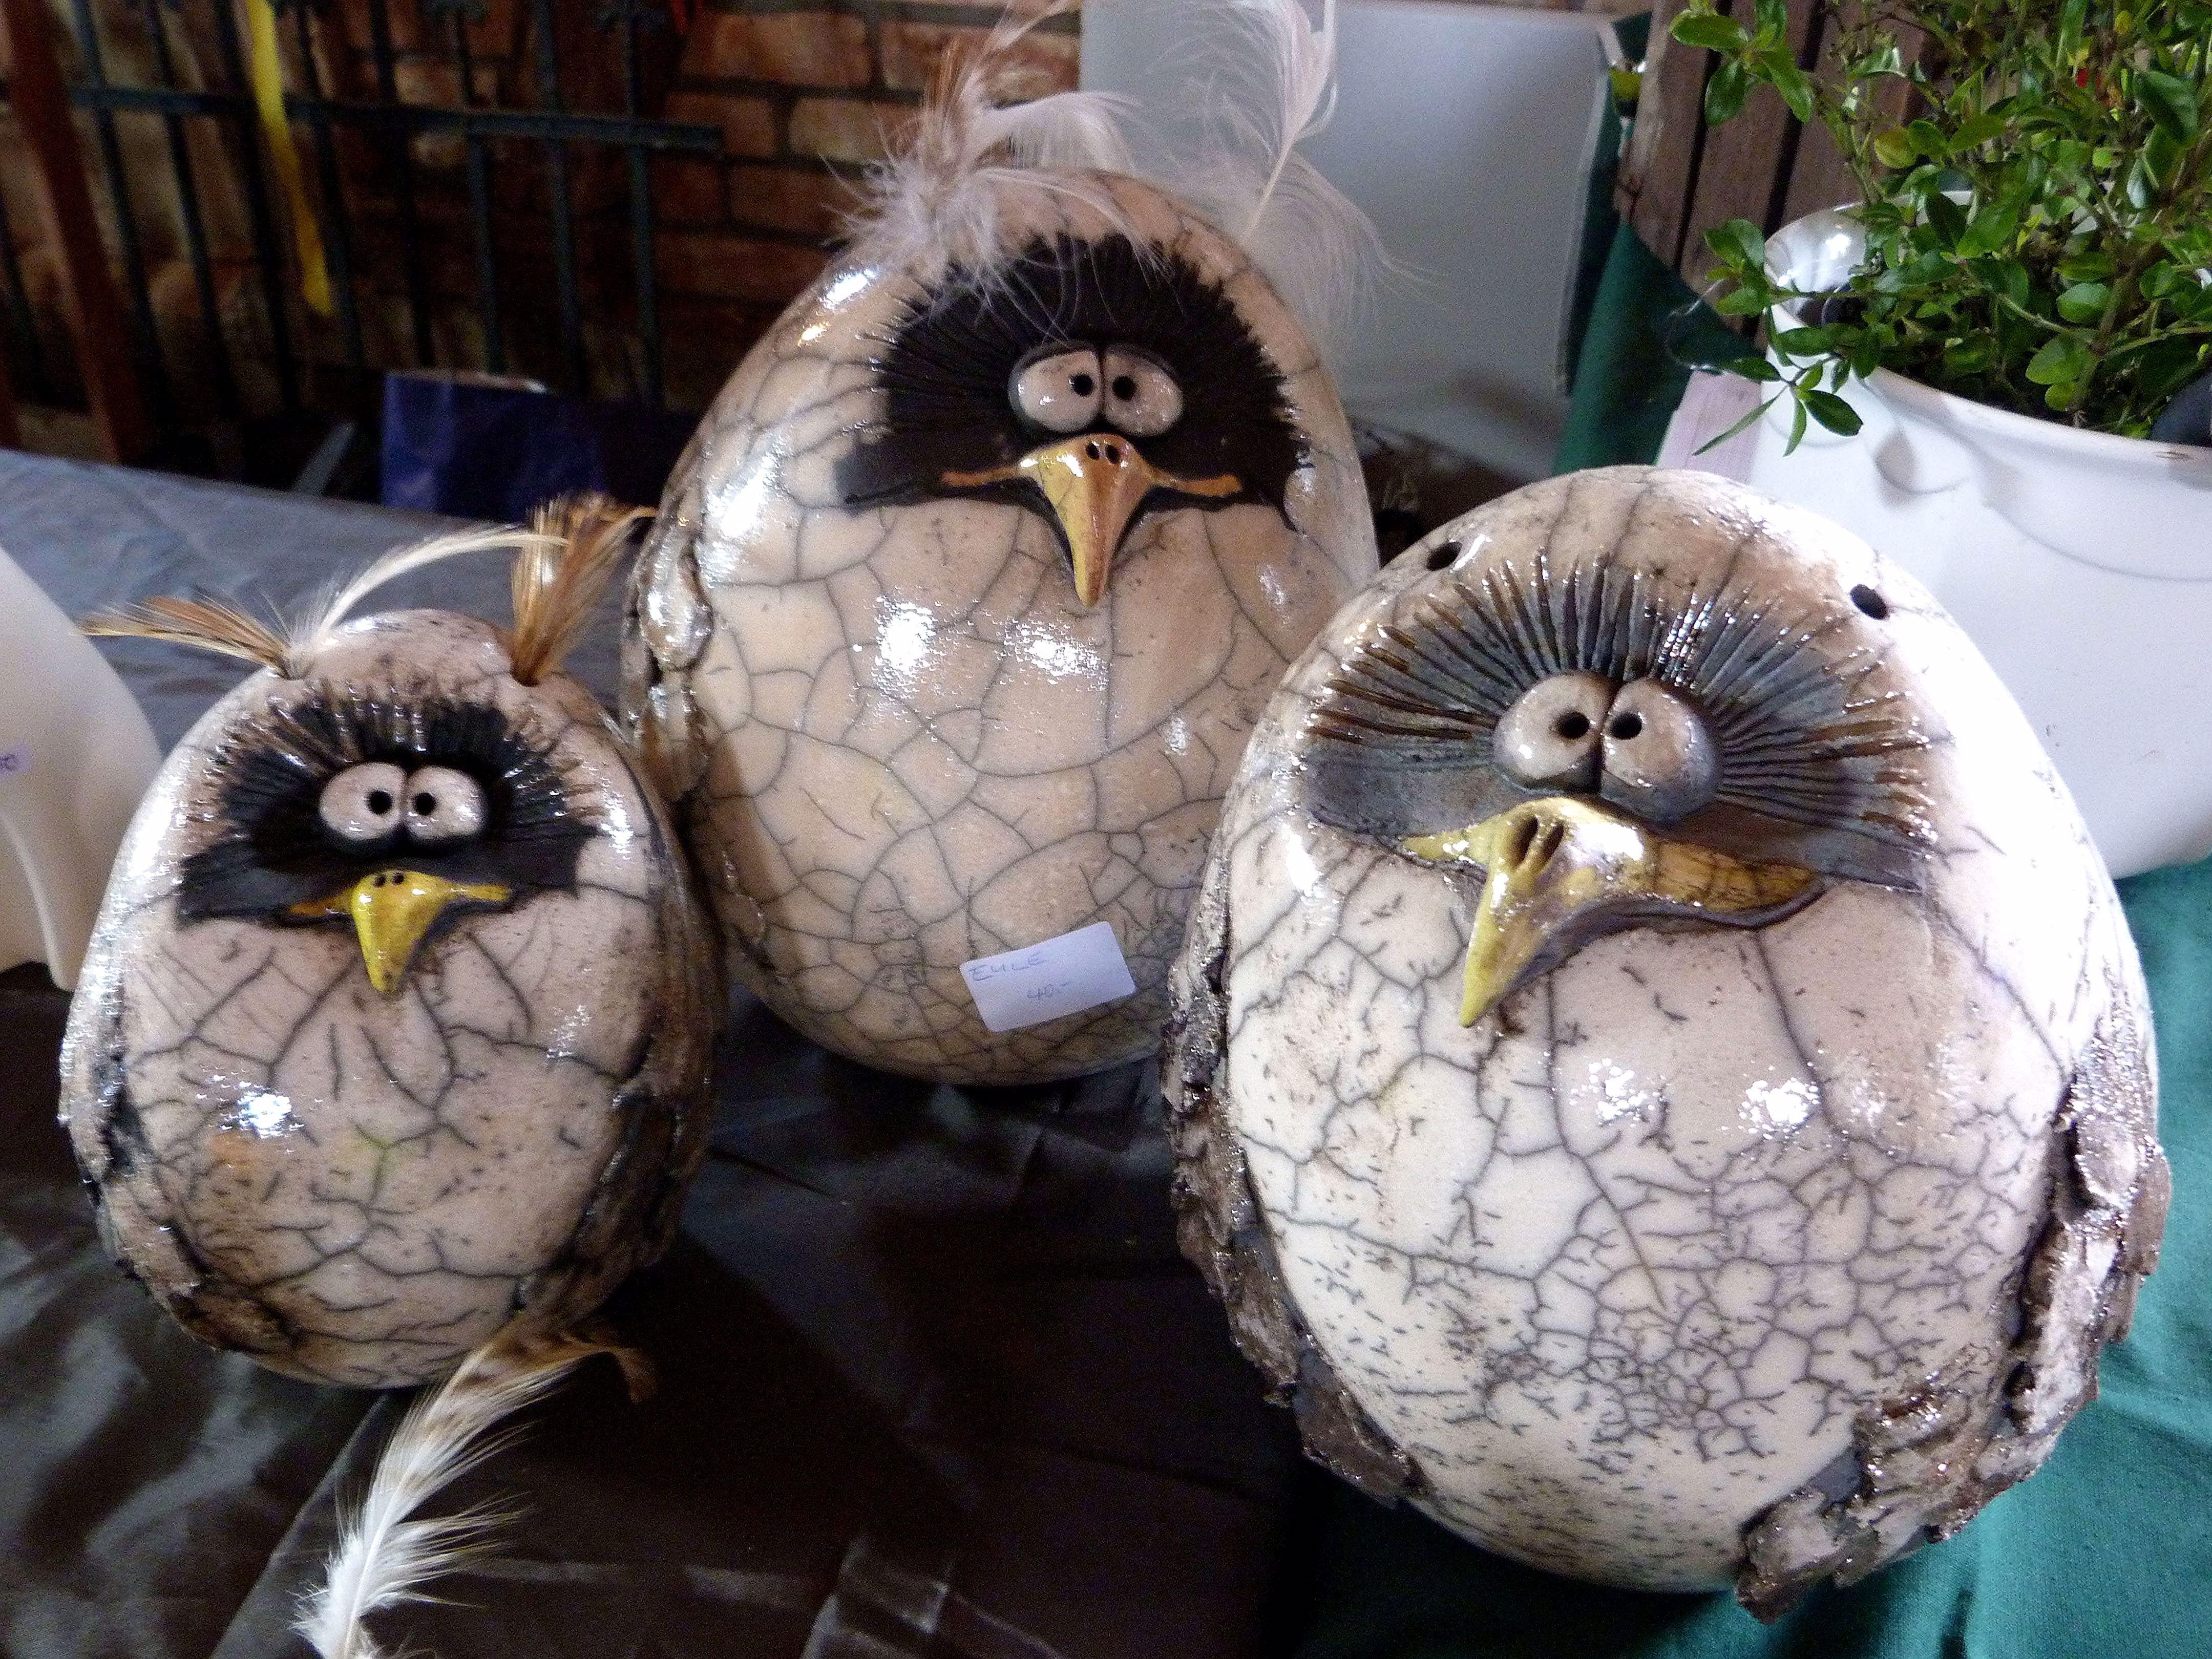 Keramik Ideen Für Den Garten